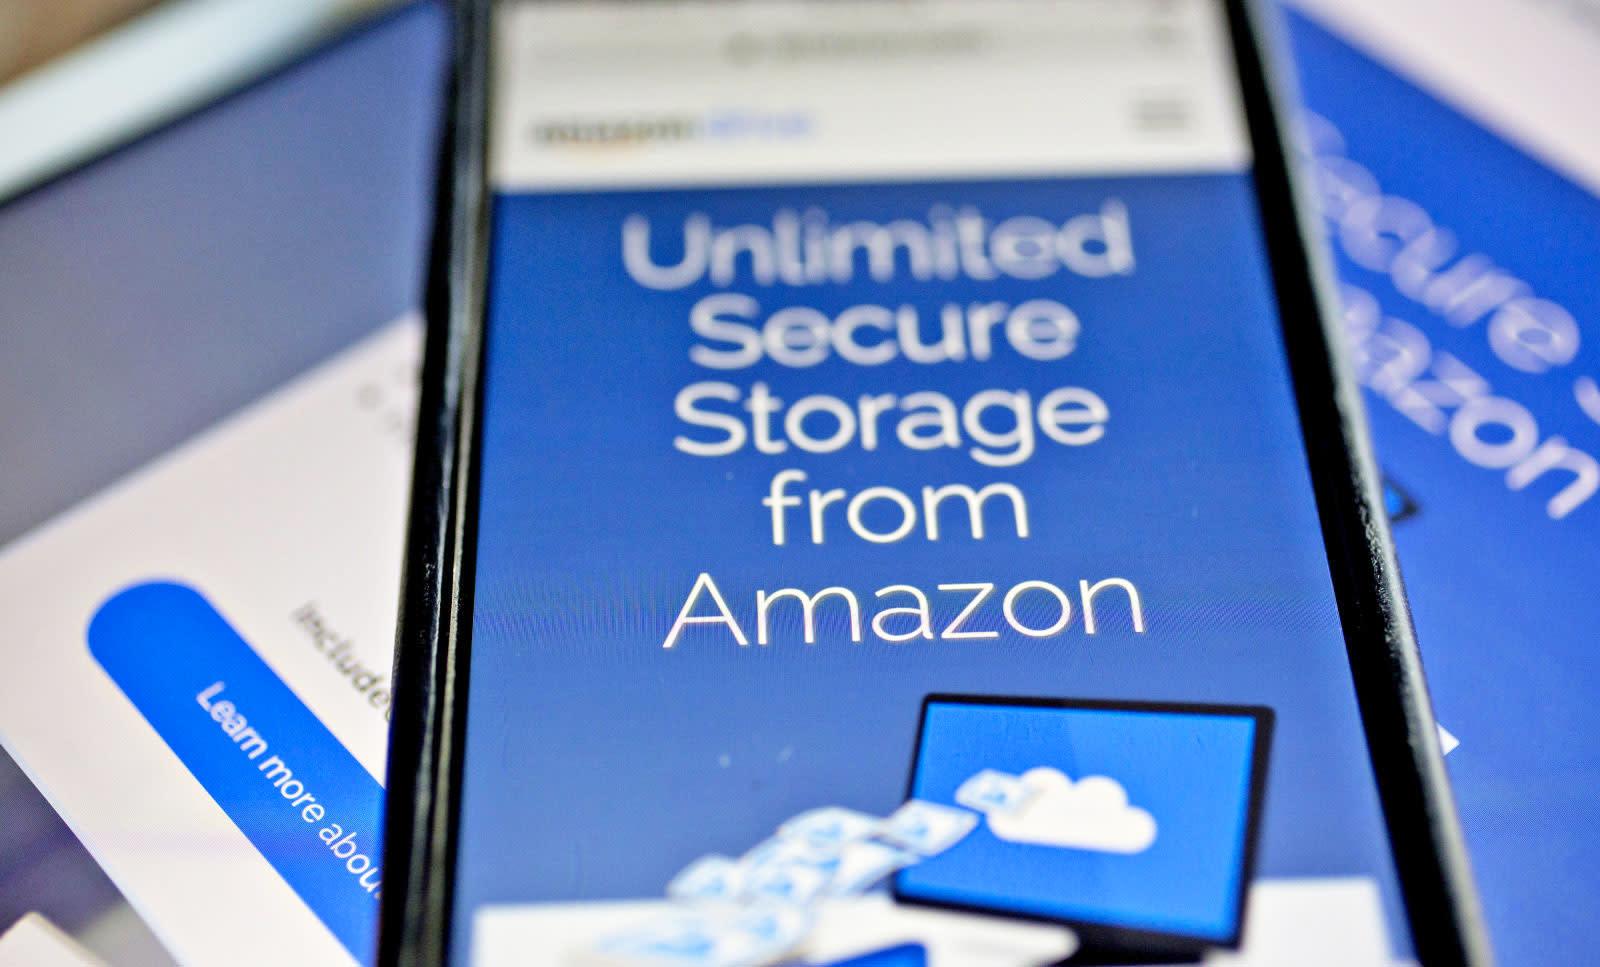 Amazon drops its unlimited cloud storage plan | Engadget